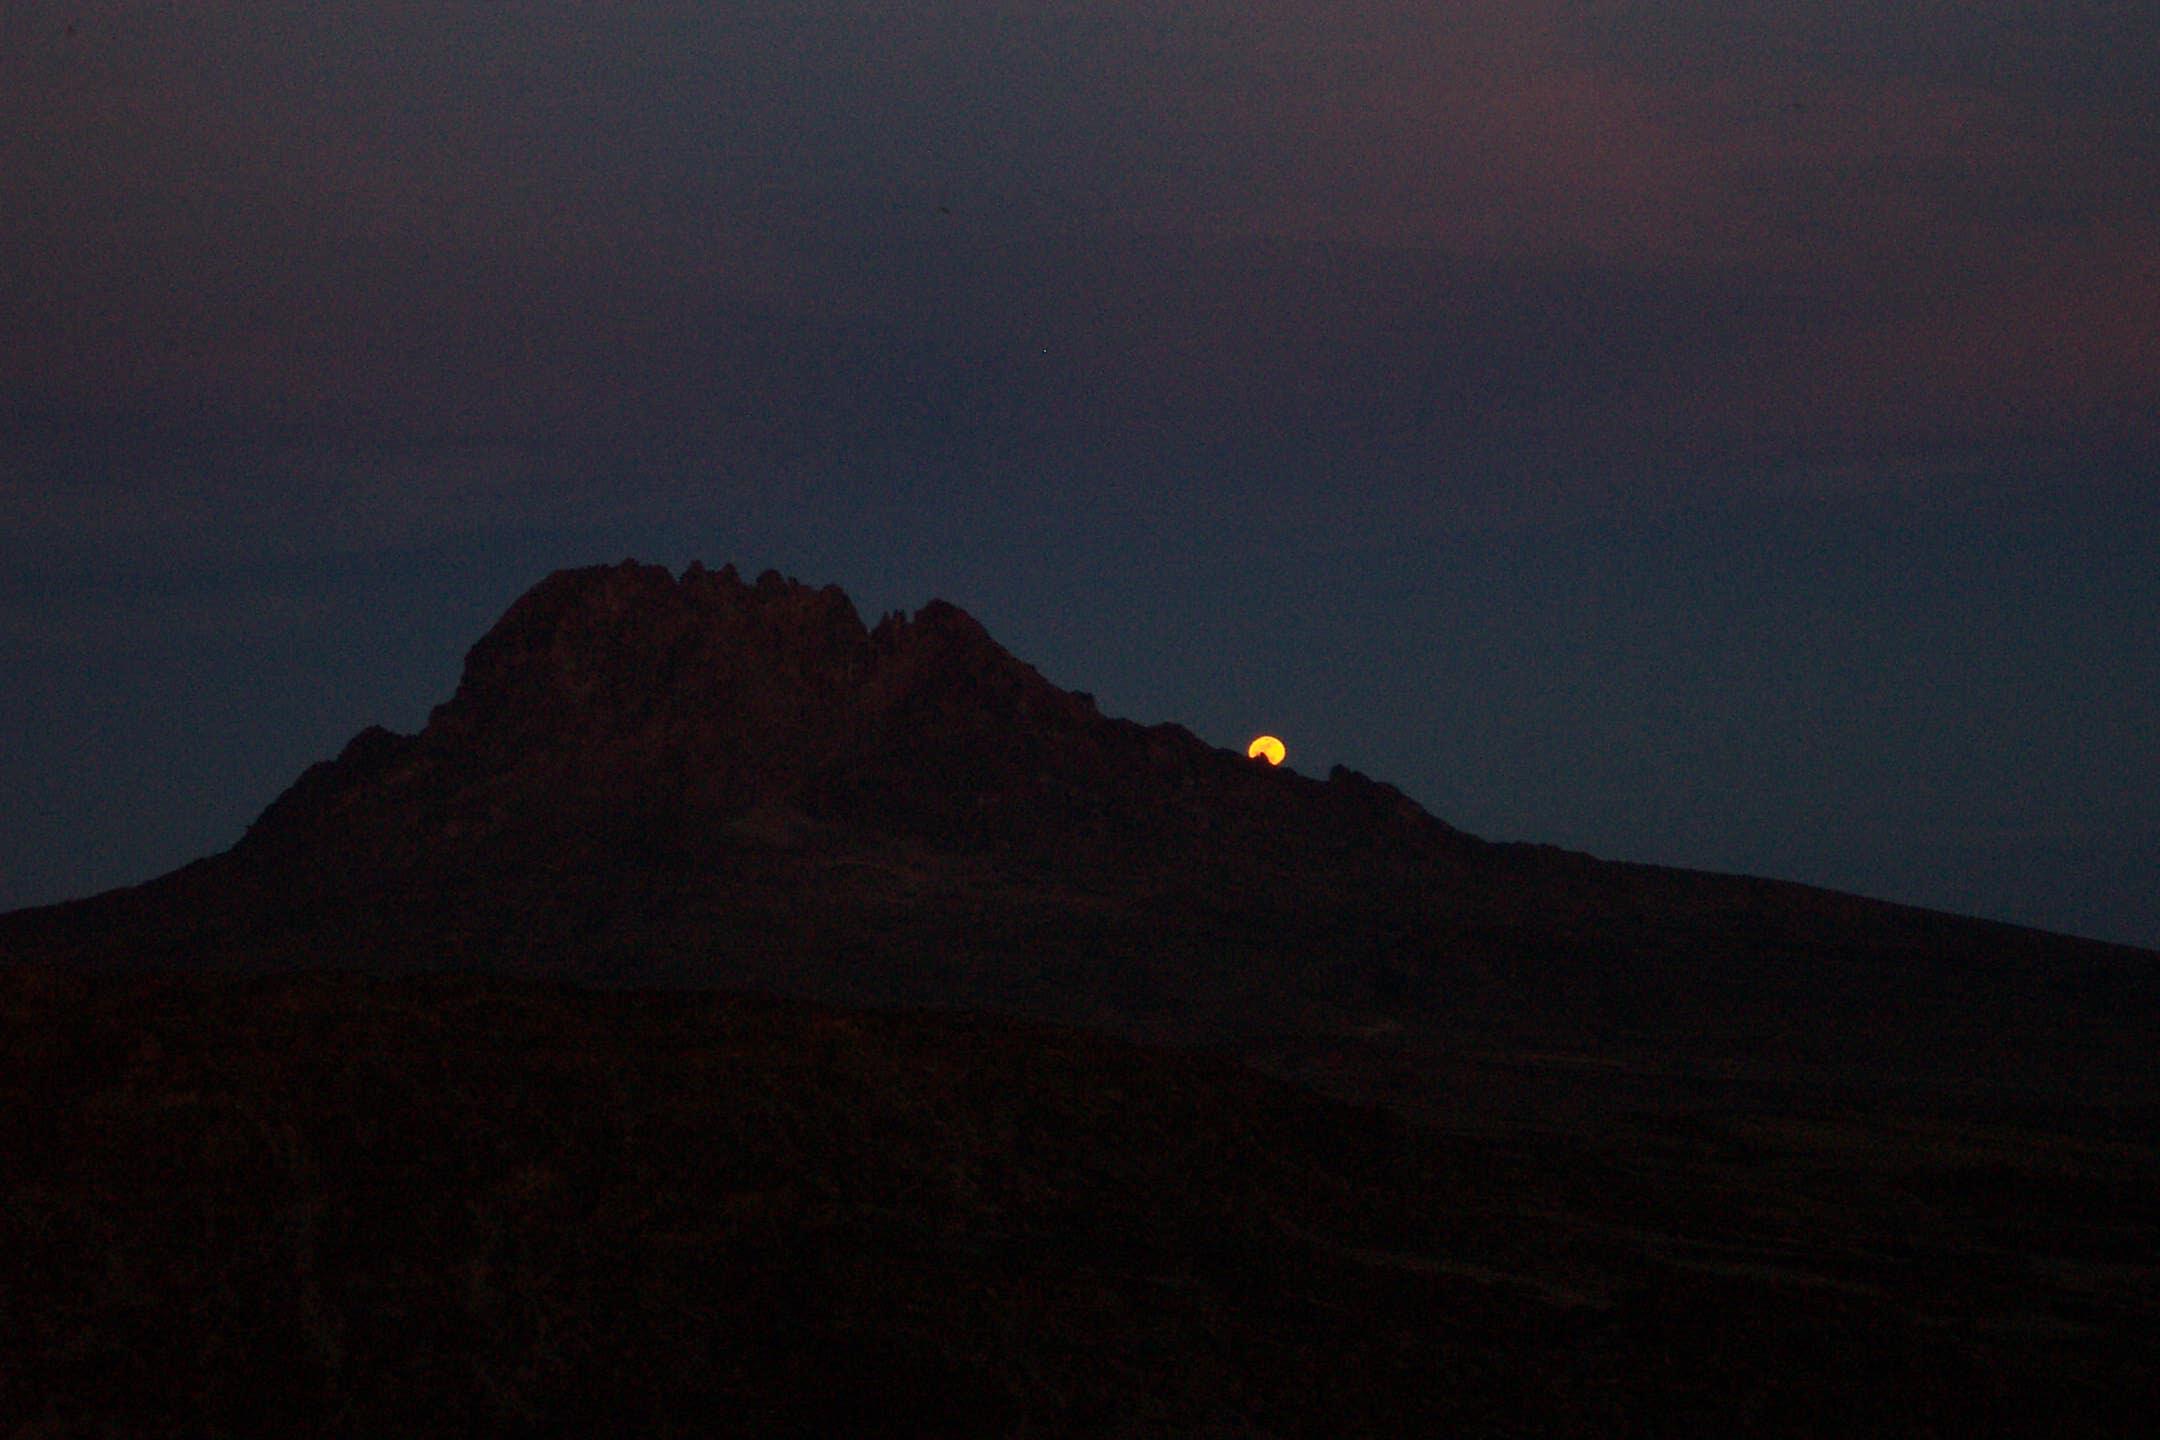 Moonrise over Kili's sister peak Mawenzi  (Eric Simonson)